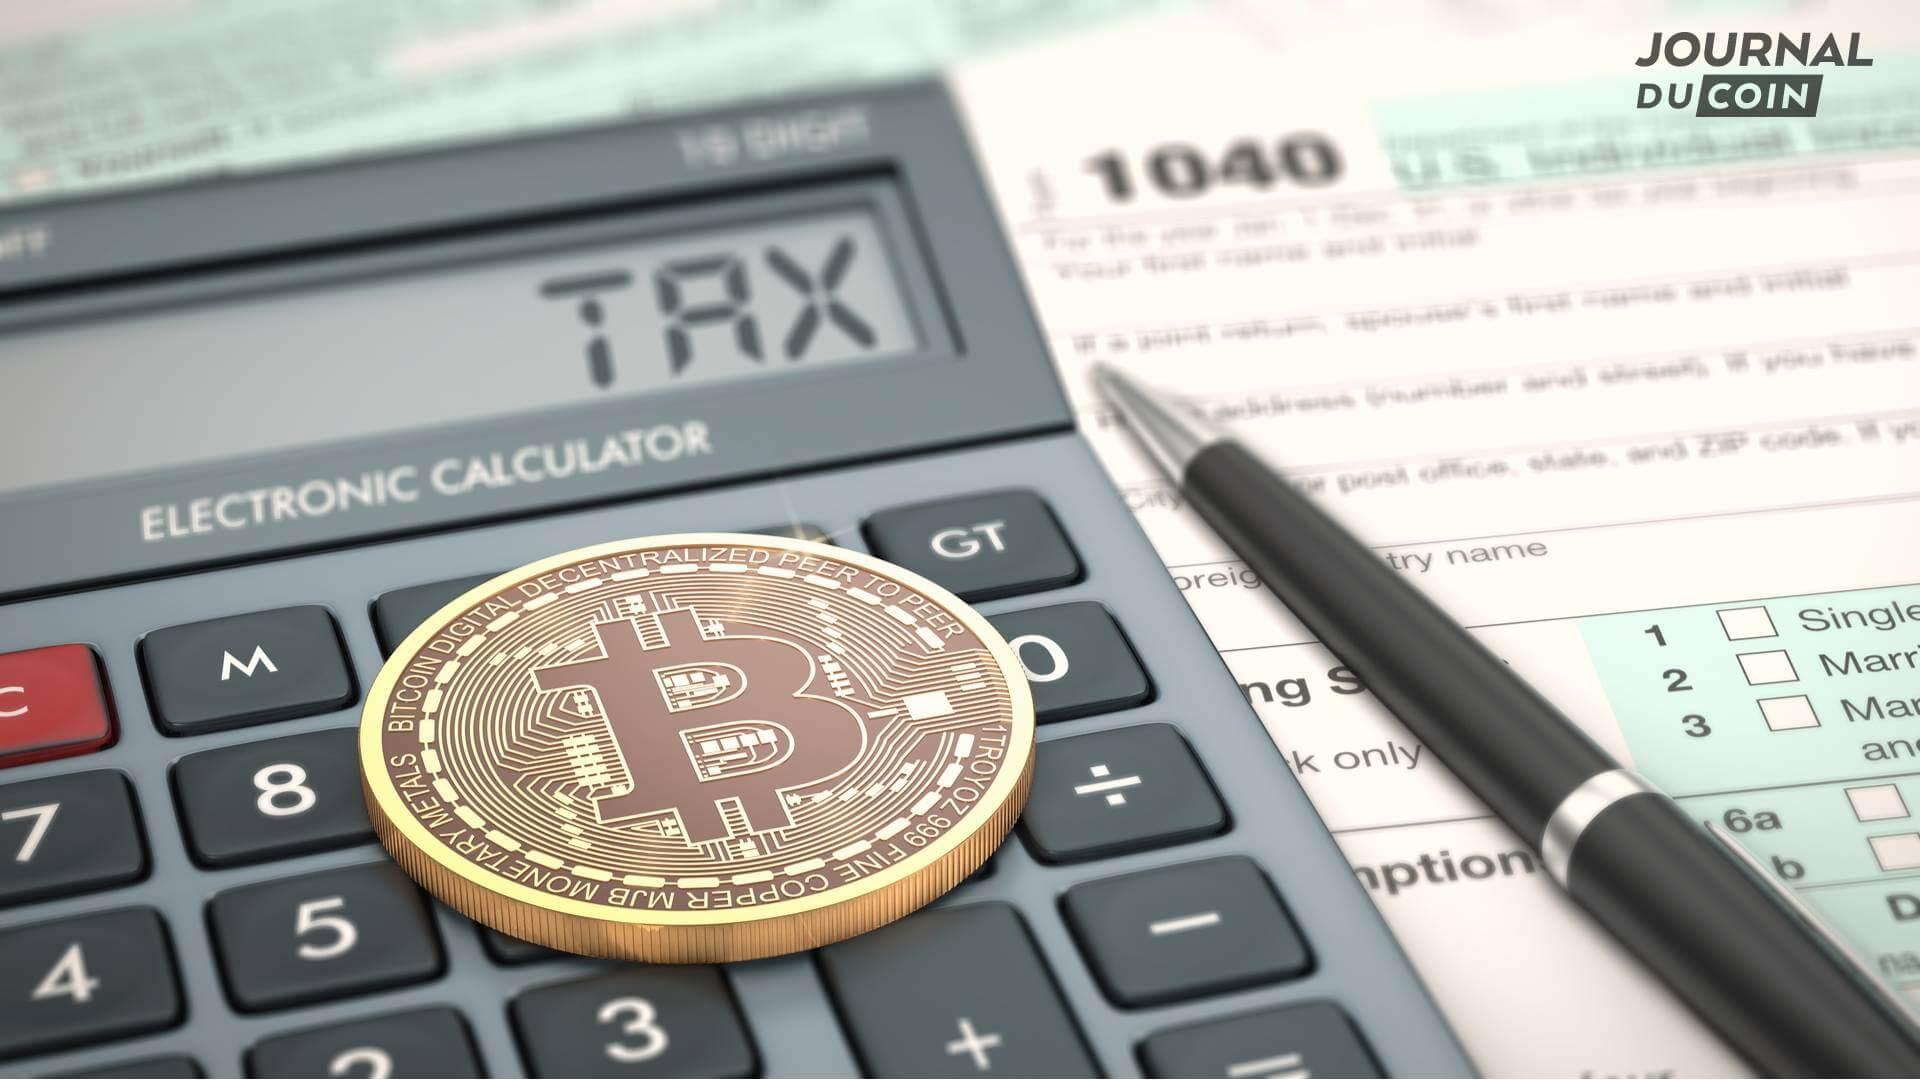 Minar bitcoins 2021 tax accumulator betting slip calculator